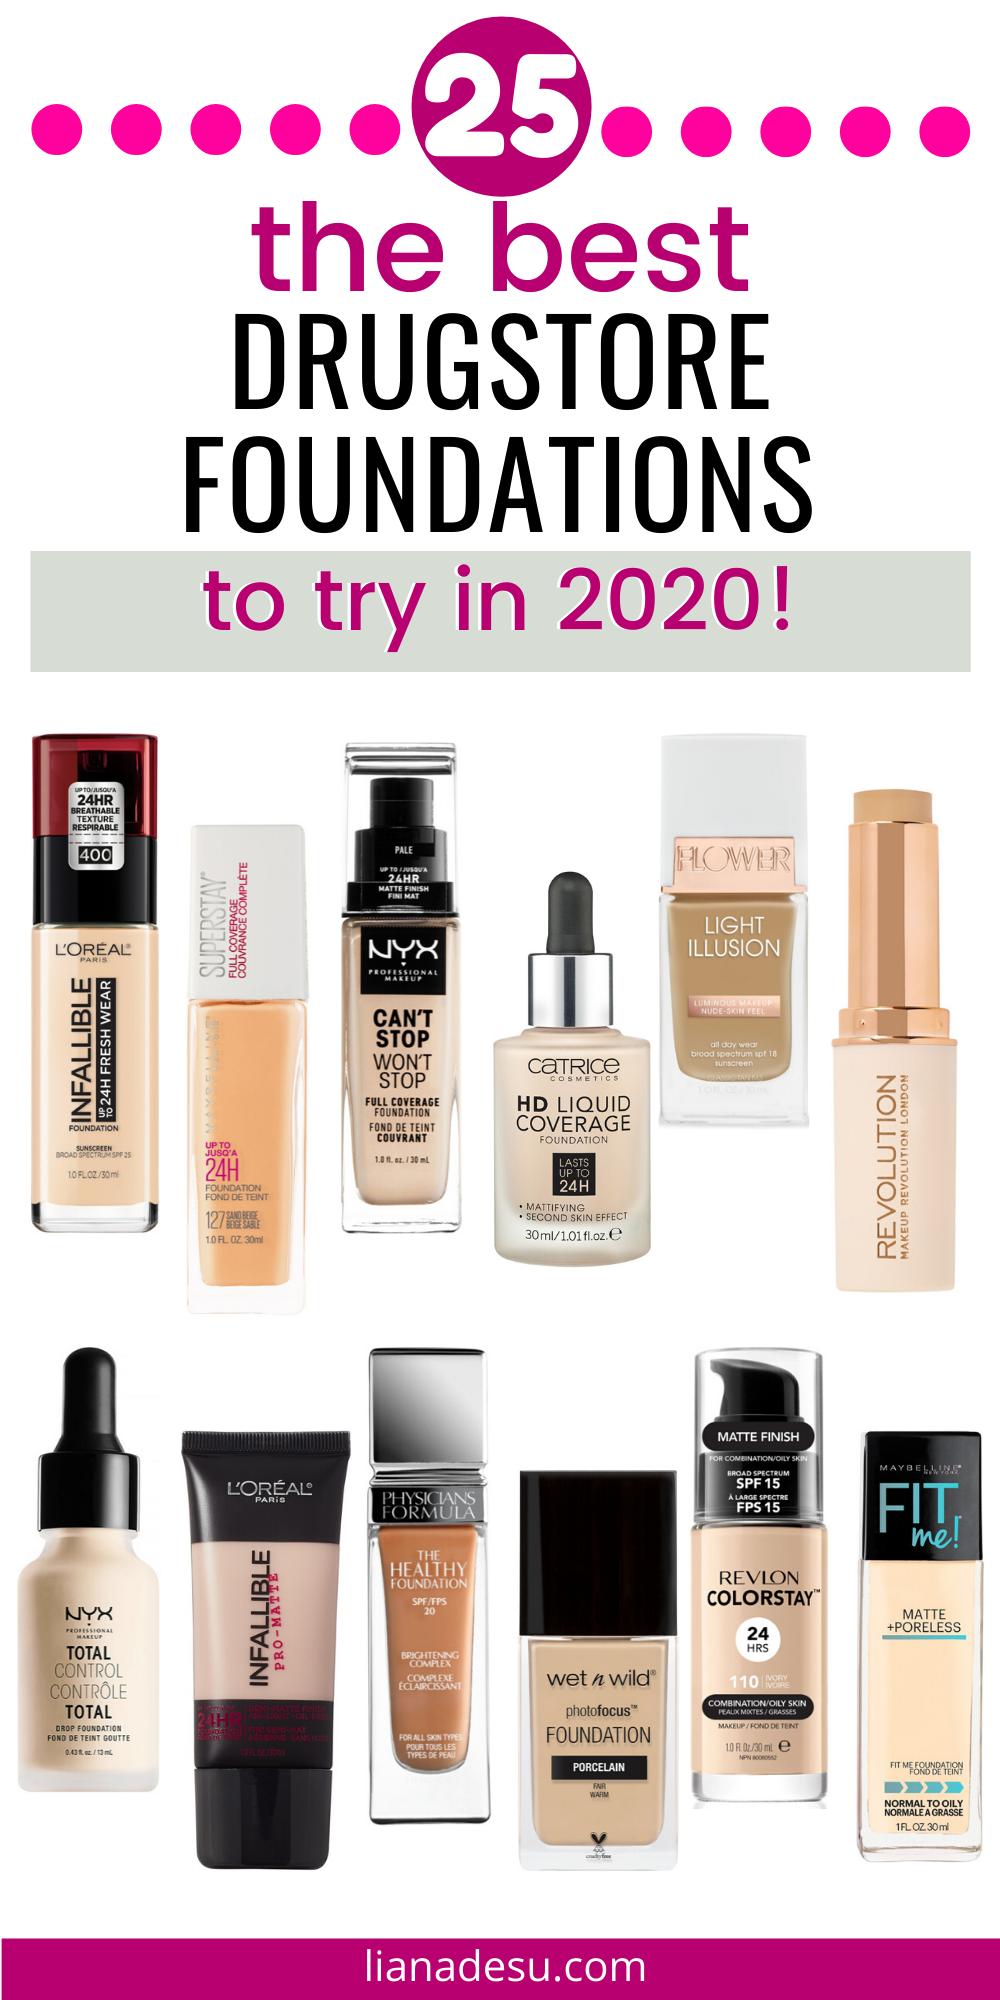 25 Best Drugstore Foundations Liana Desu In 2020 Best Drugstore Foundation Combo Skin Best Drugstore Makeup